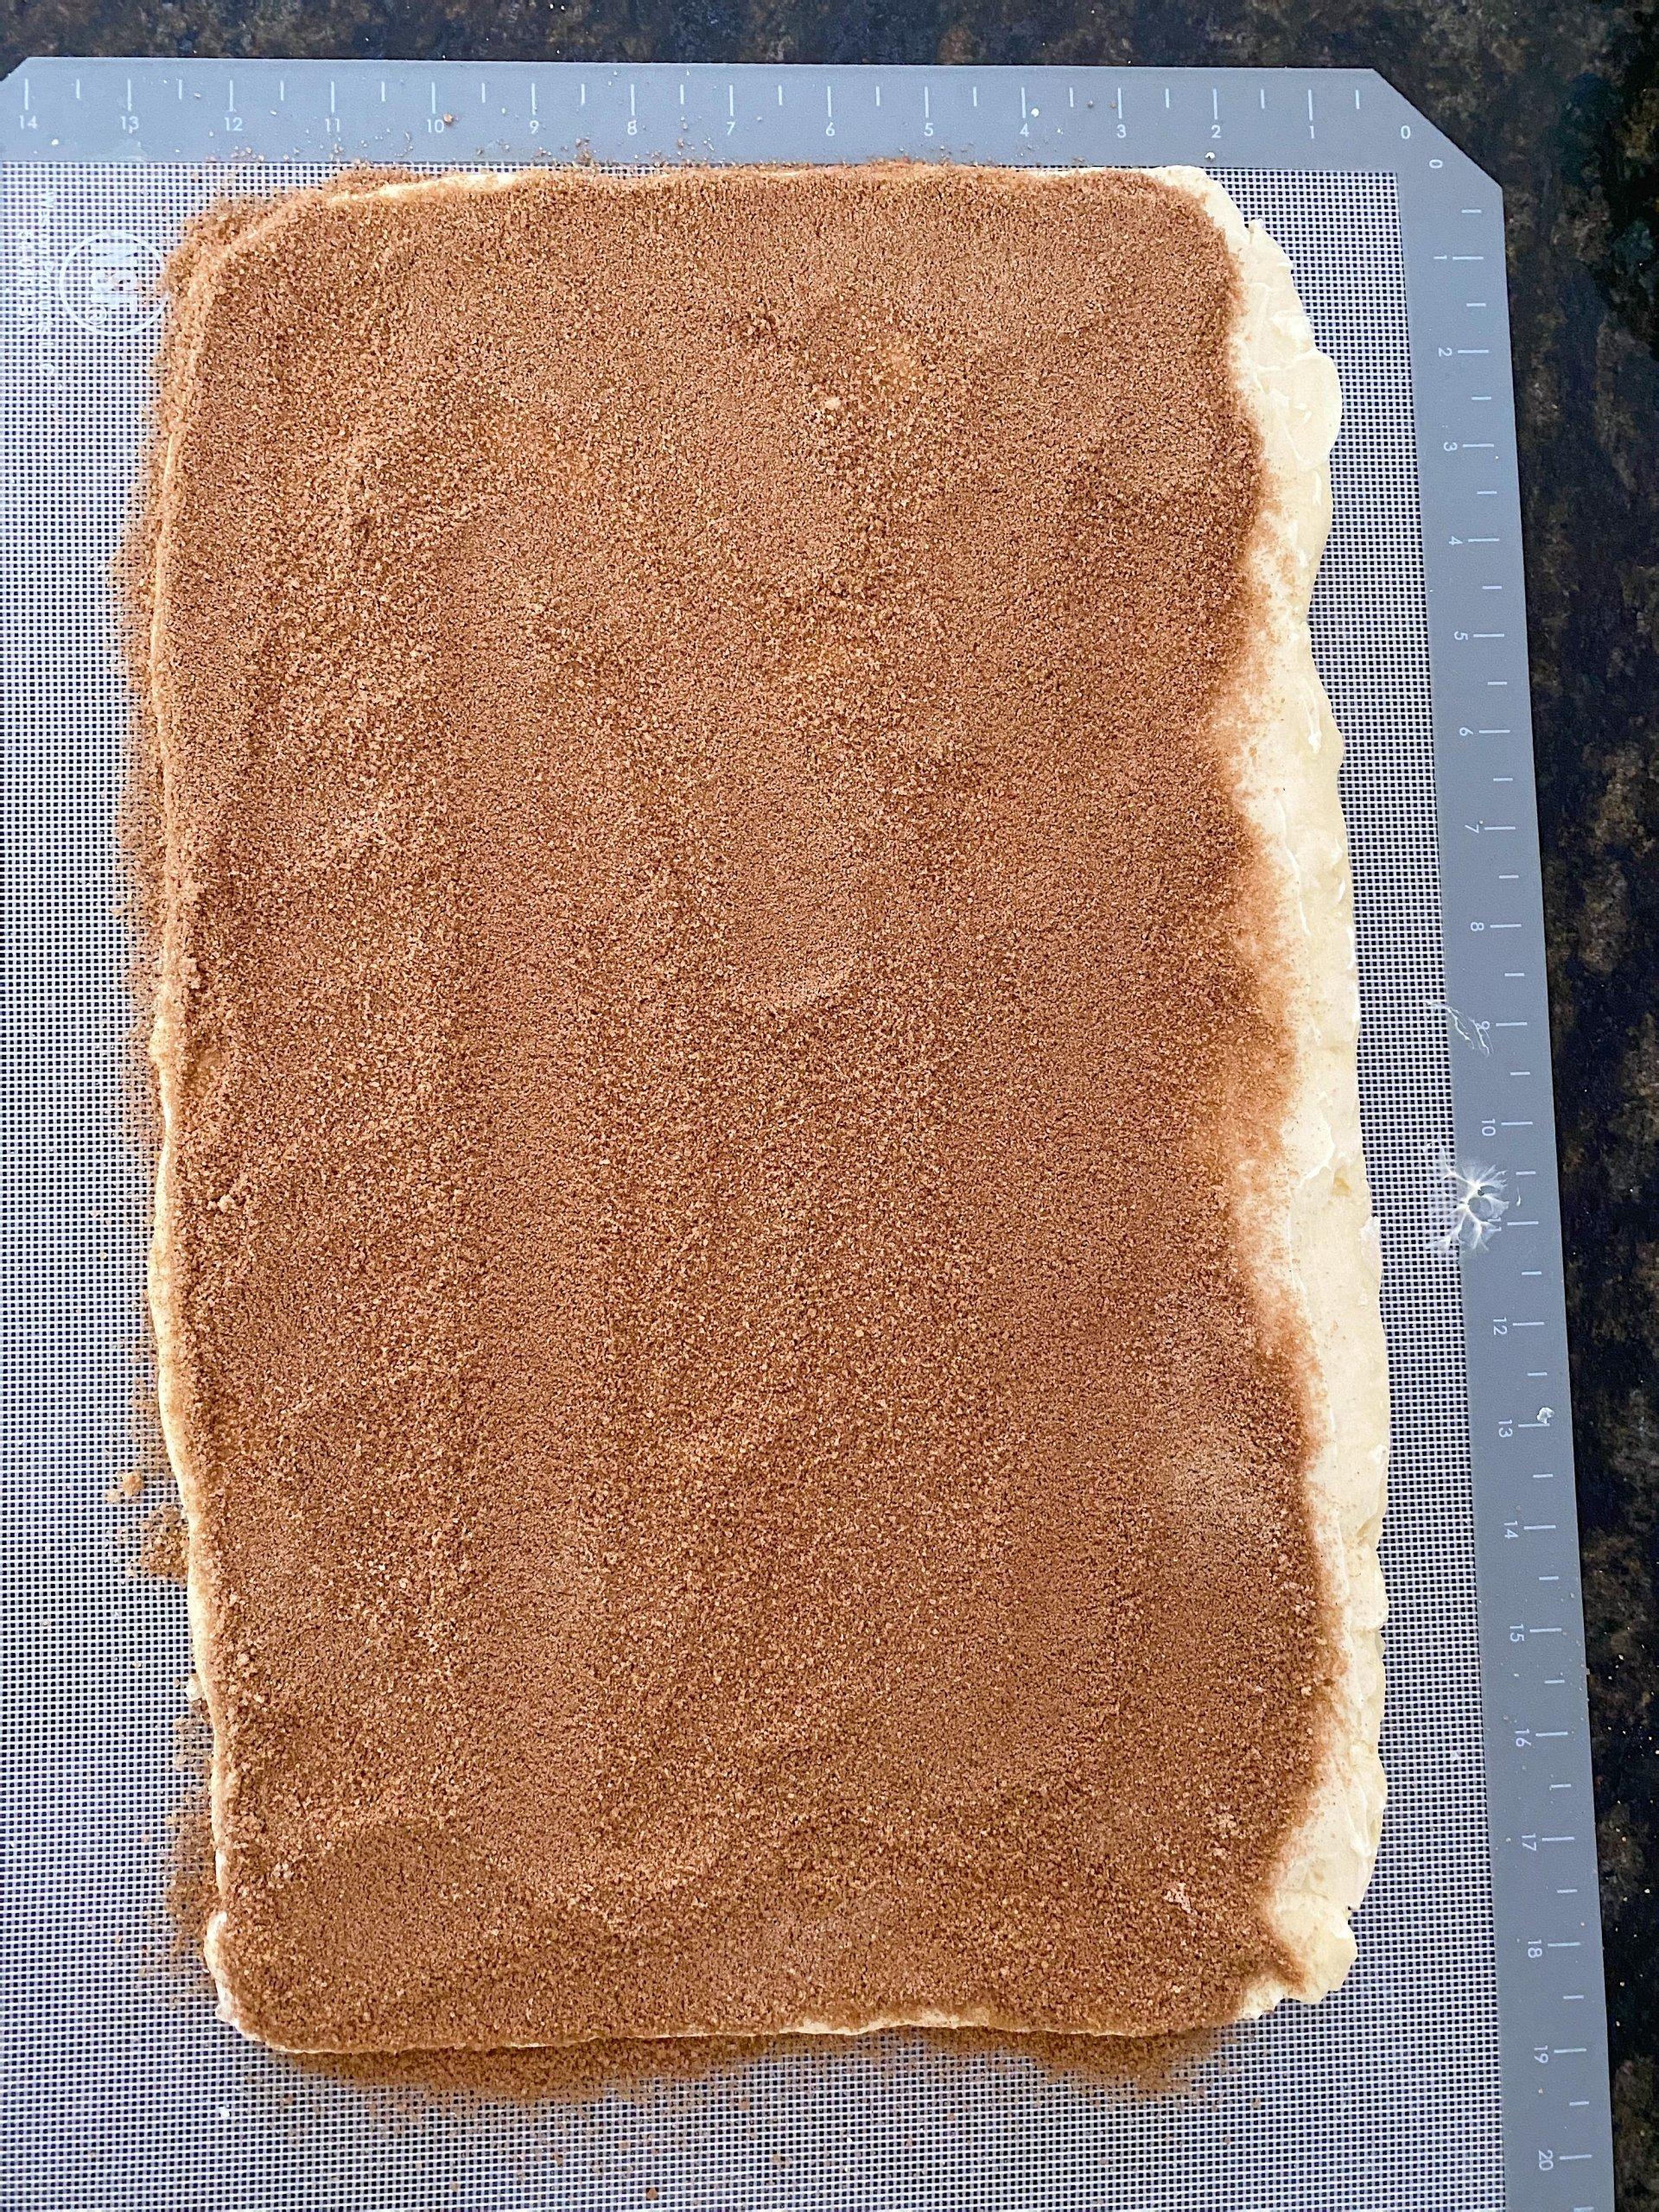 gluten free cinnamon rolls easy recipe #glutenfreerecipes www.healthygffamily.com